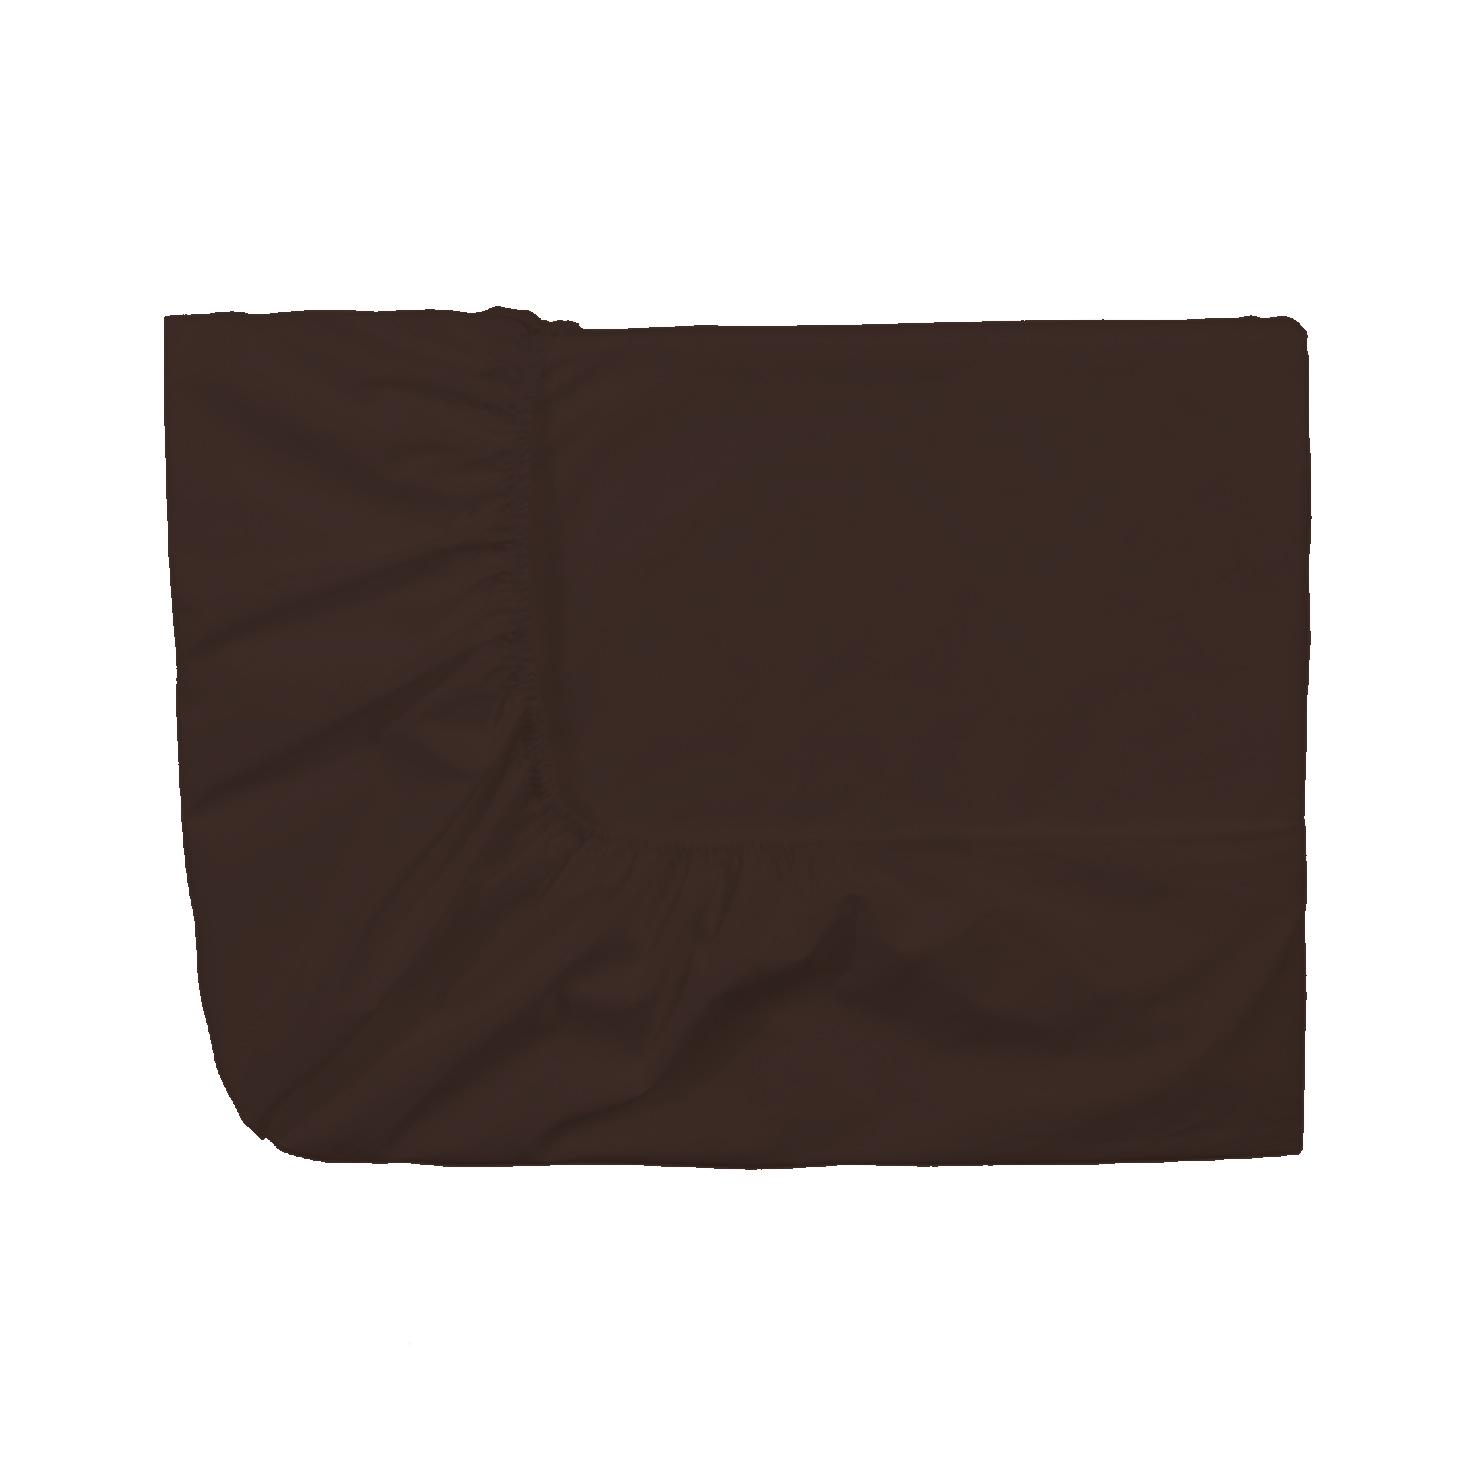 Essix c percale coton drap housse tabac for Draps housse percale